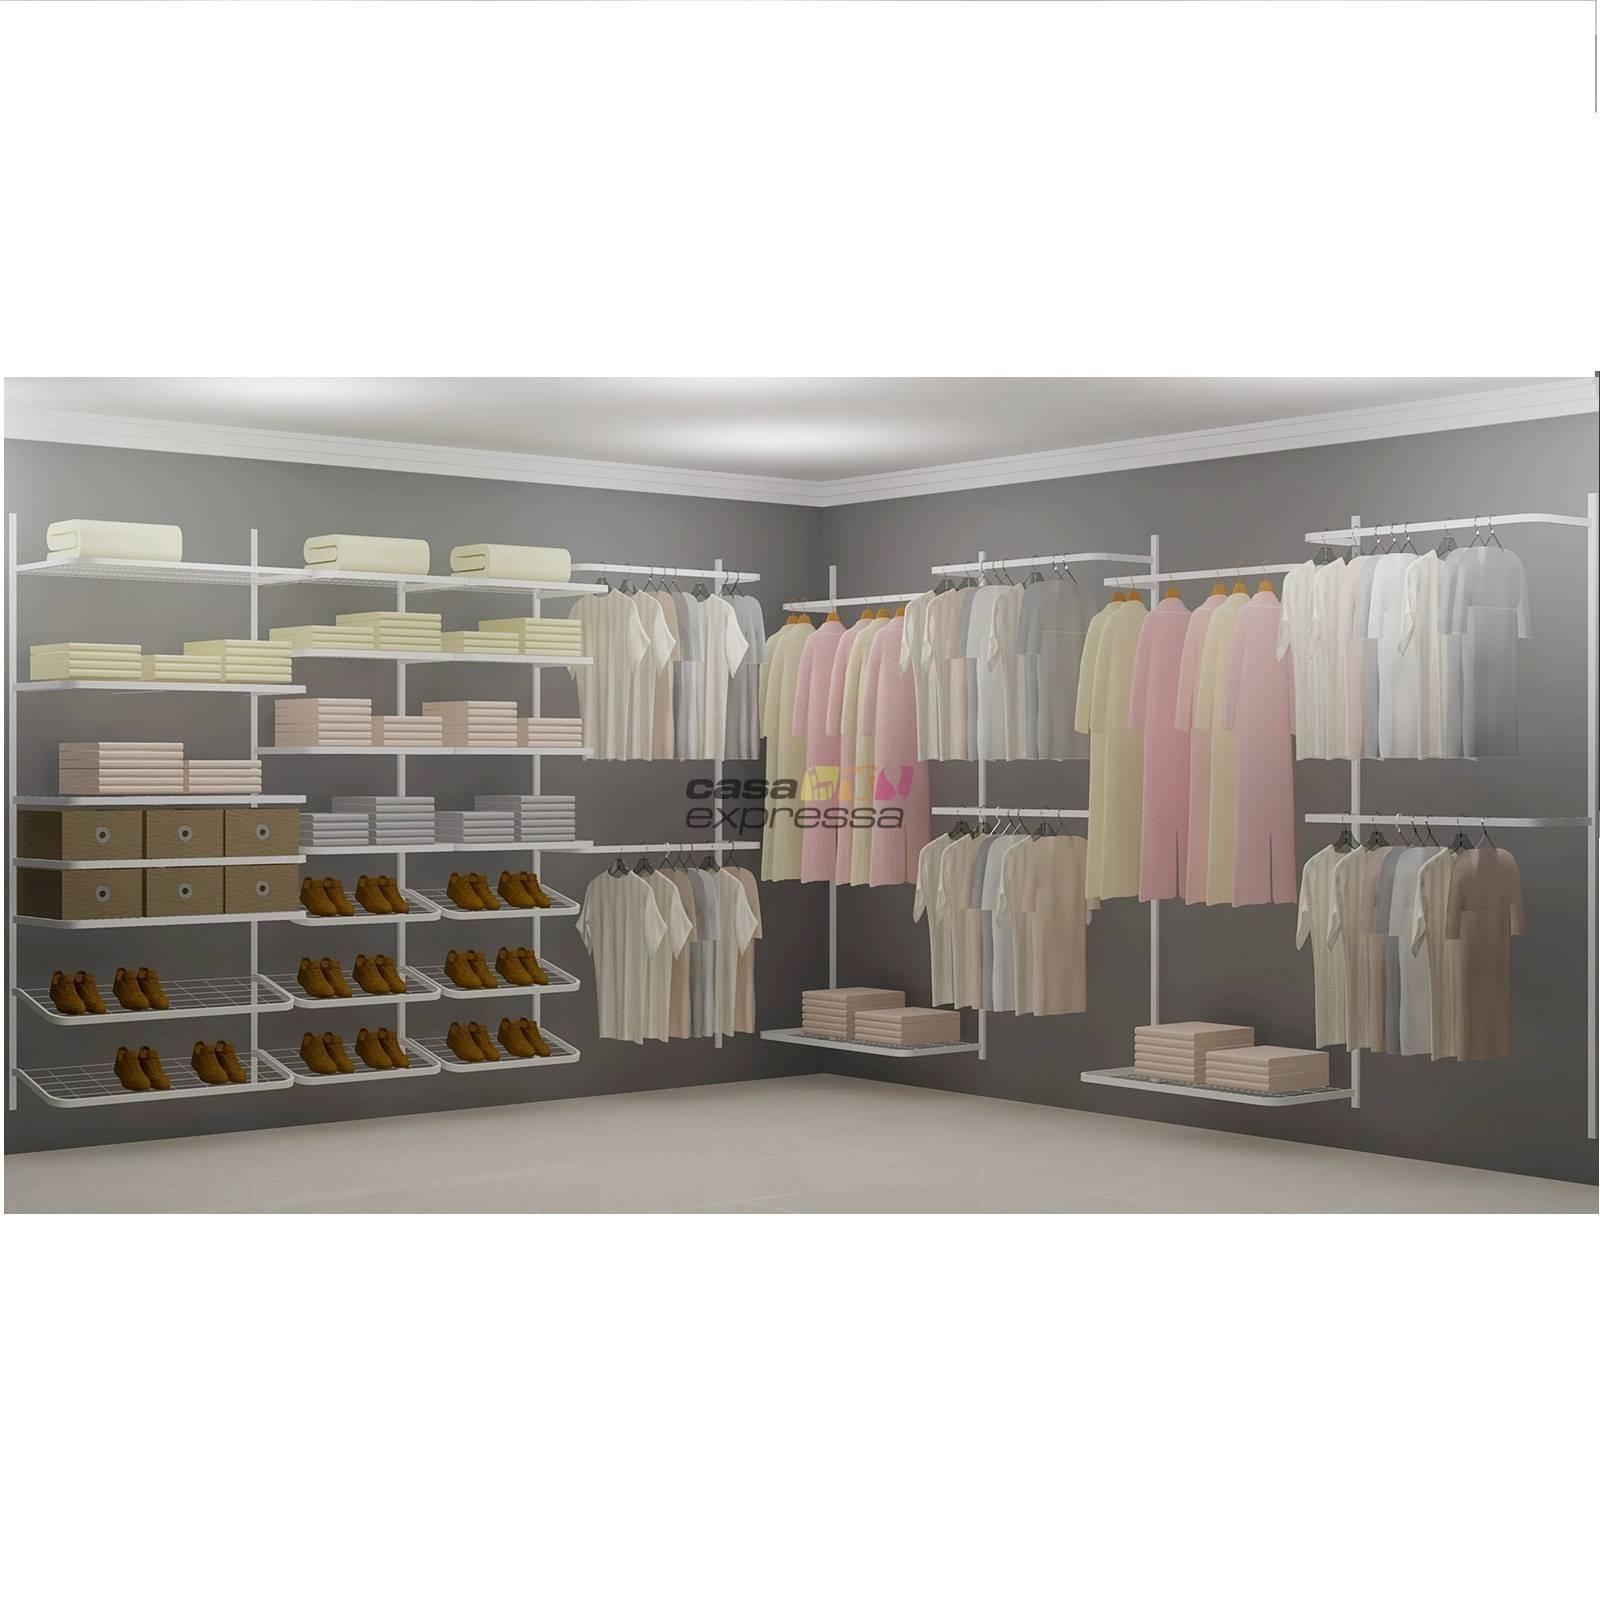 Closet Aramado em L  CLN09 - 4,00 x 4,00m - CASA EXPRESSA